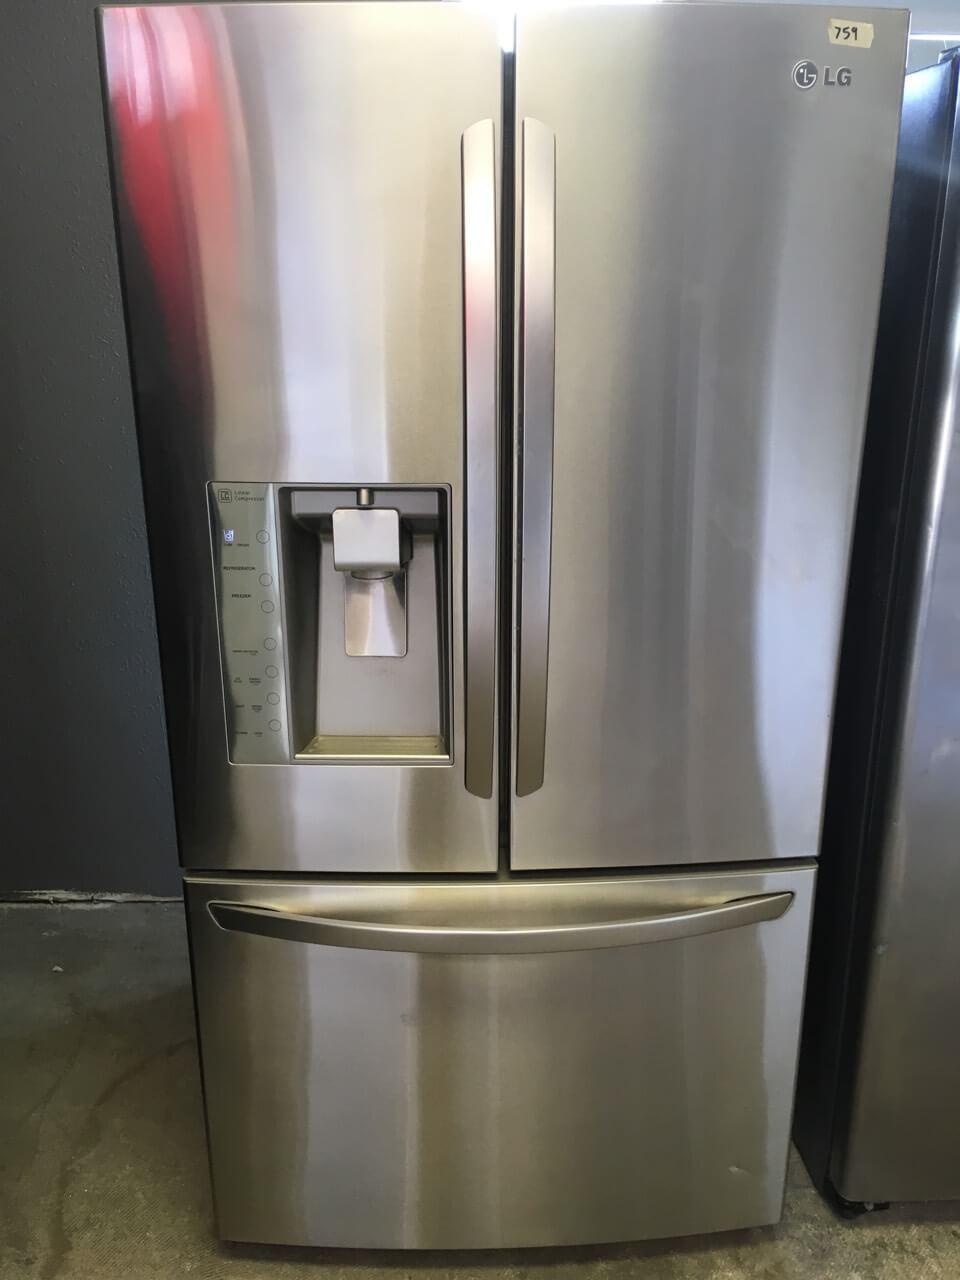 LG Stainless Steel 36 Inch French Door Fridge